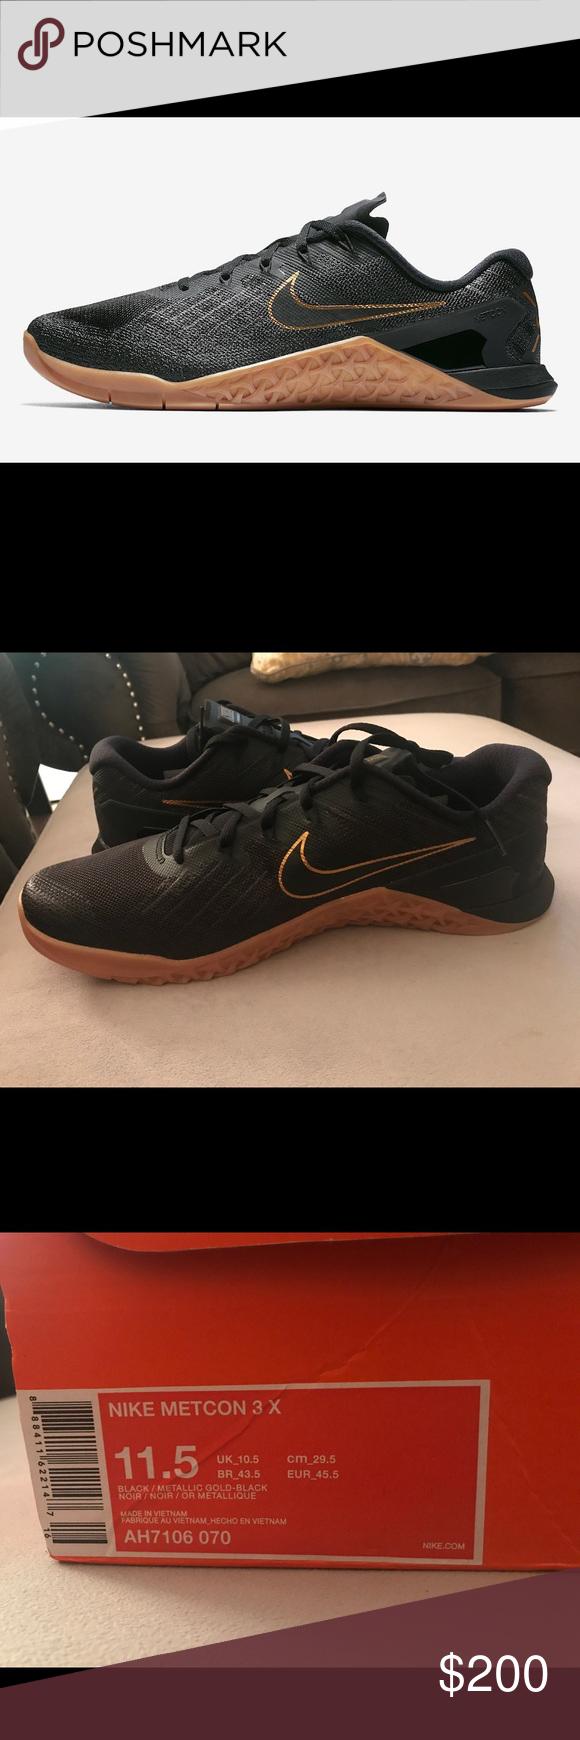 Men's Nike Metcon 3x. Men's Nike Metcon size men's Nike metcon limited  edition black and gold metcon sneakers. ...